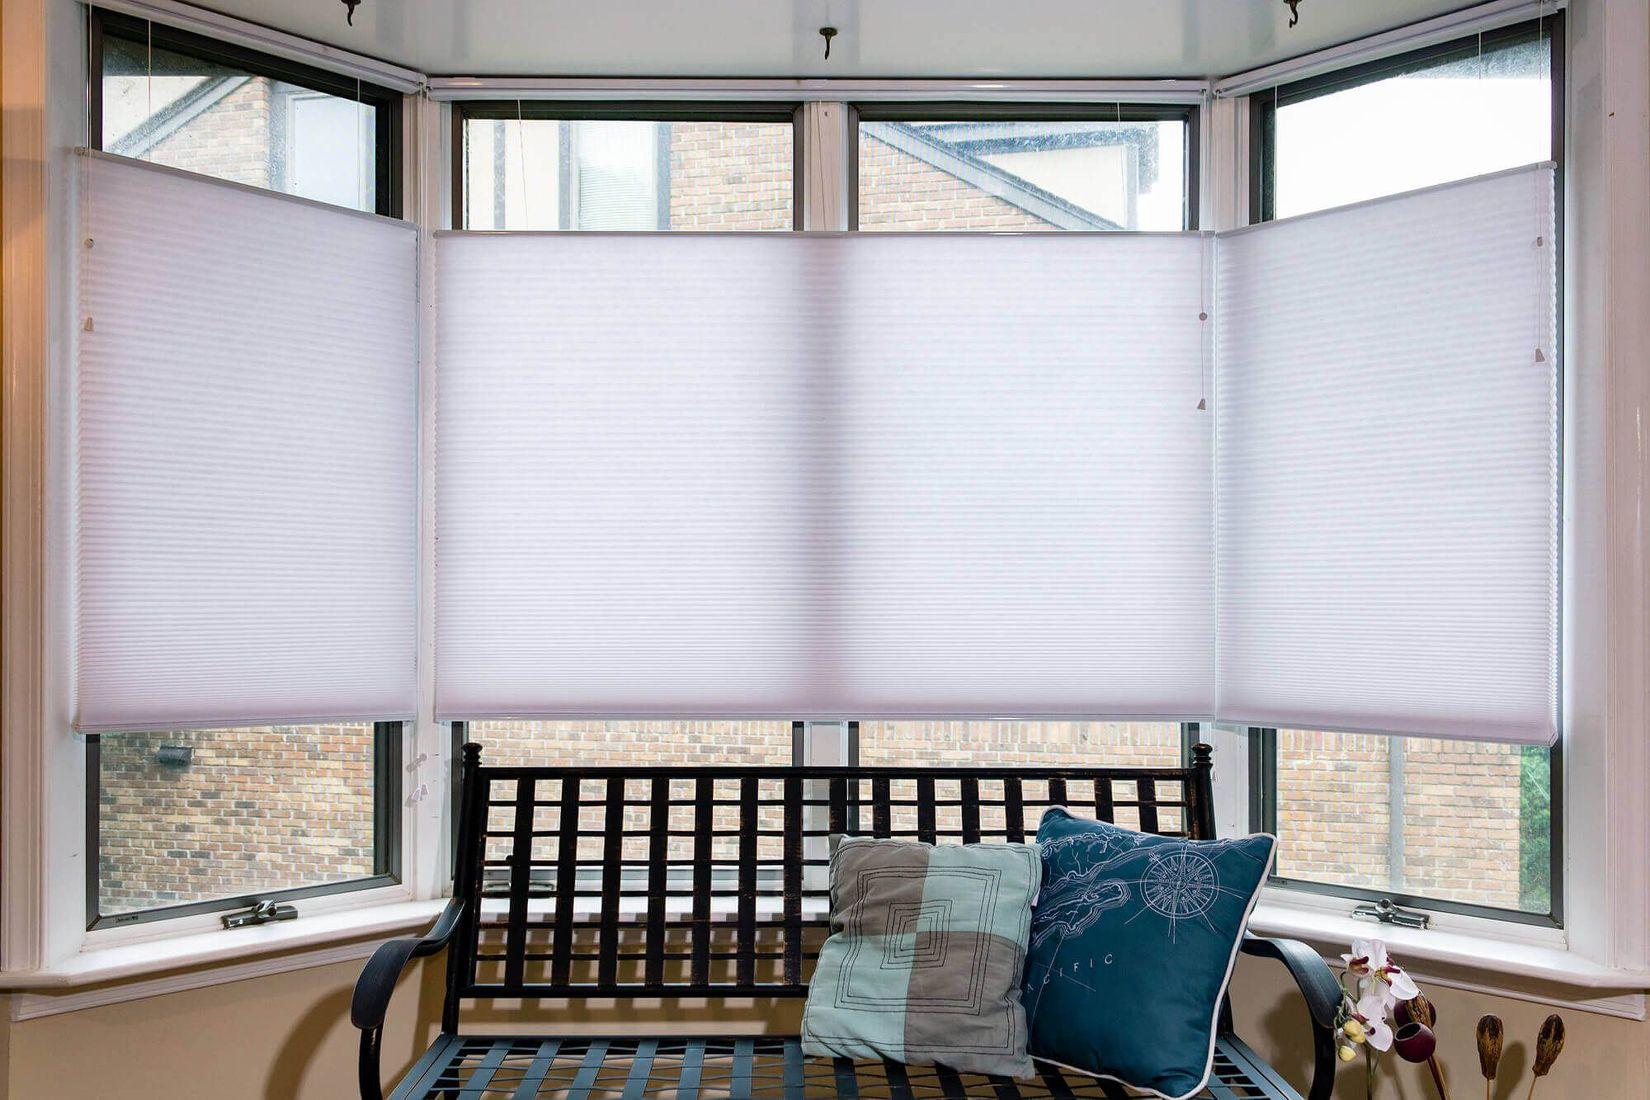 honeycomb shades prestige cellular shades top down bottom up for bay windows looks sleek QRXILTK